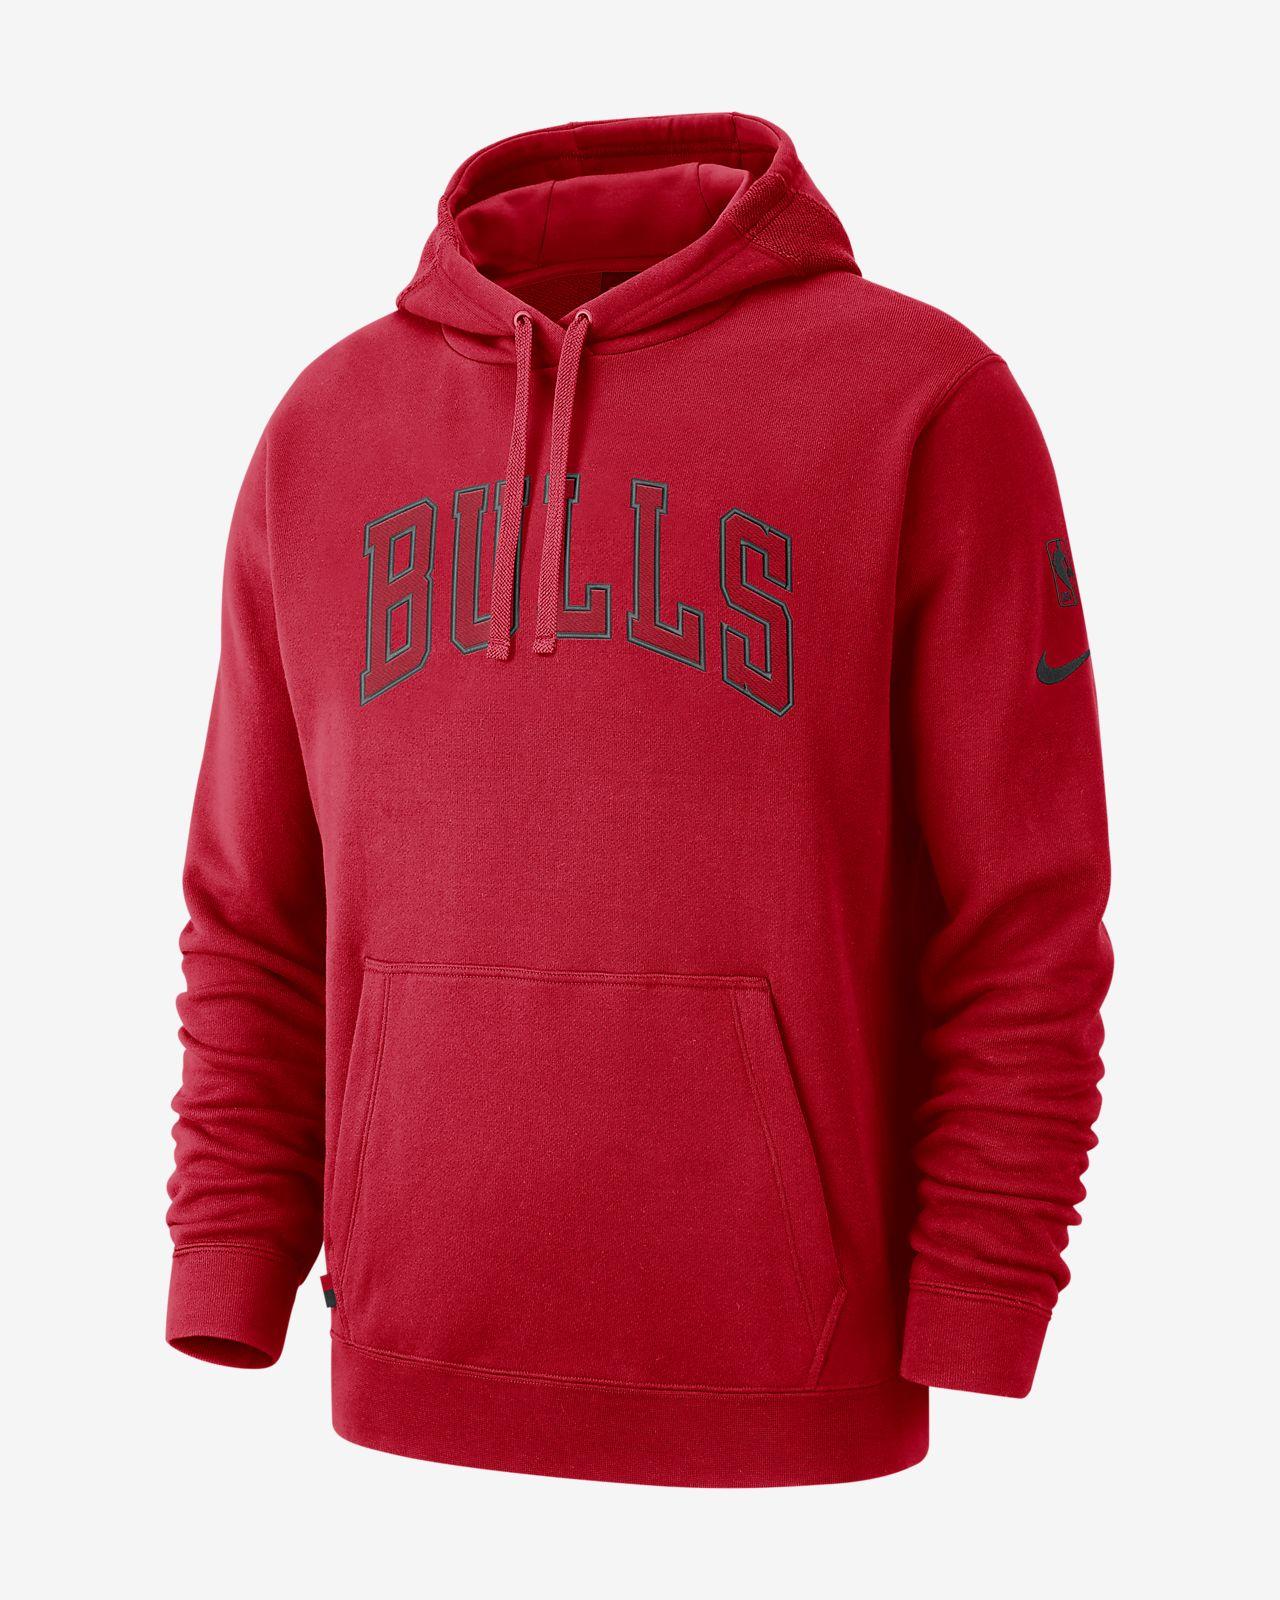 Sudadera con capucha de la NBA para hombre Chicago Bulls Nike. Nike ... 80e0e1a85eb